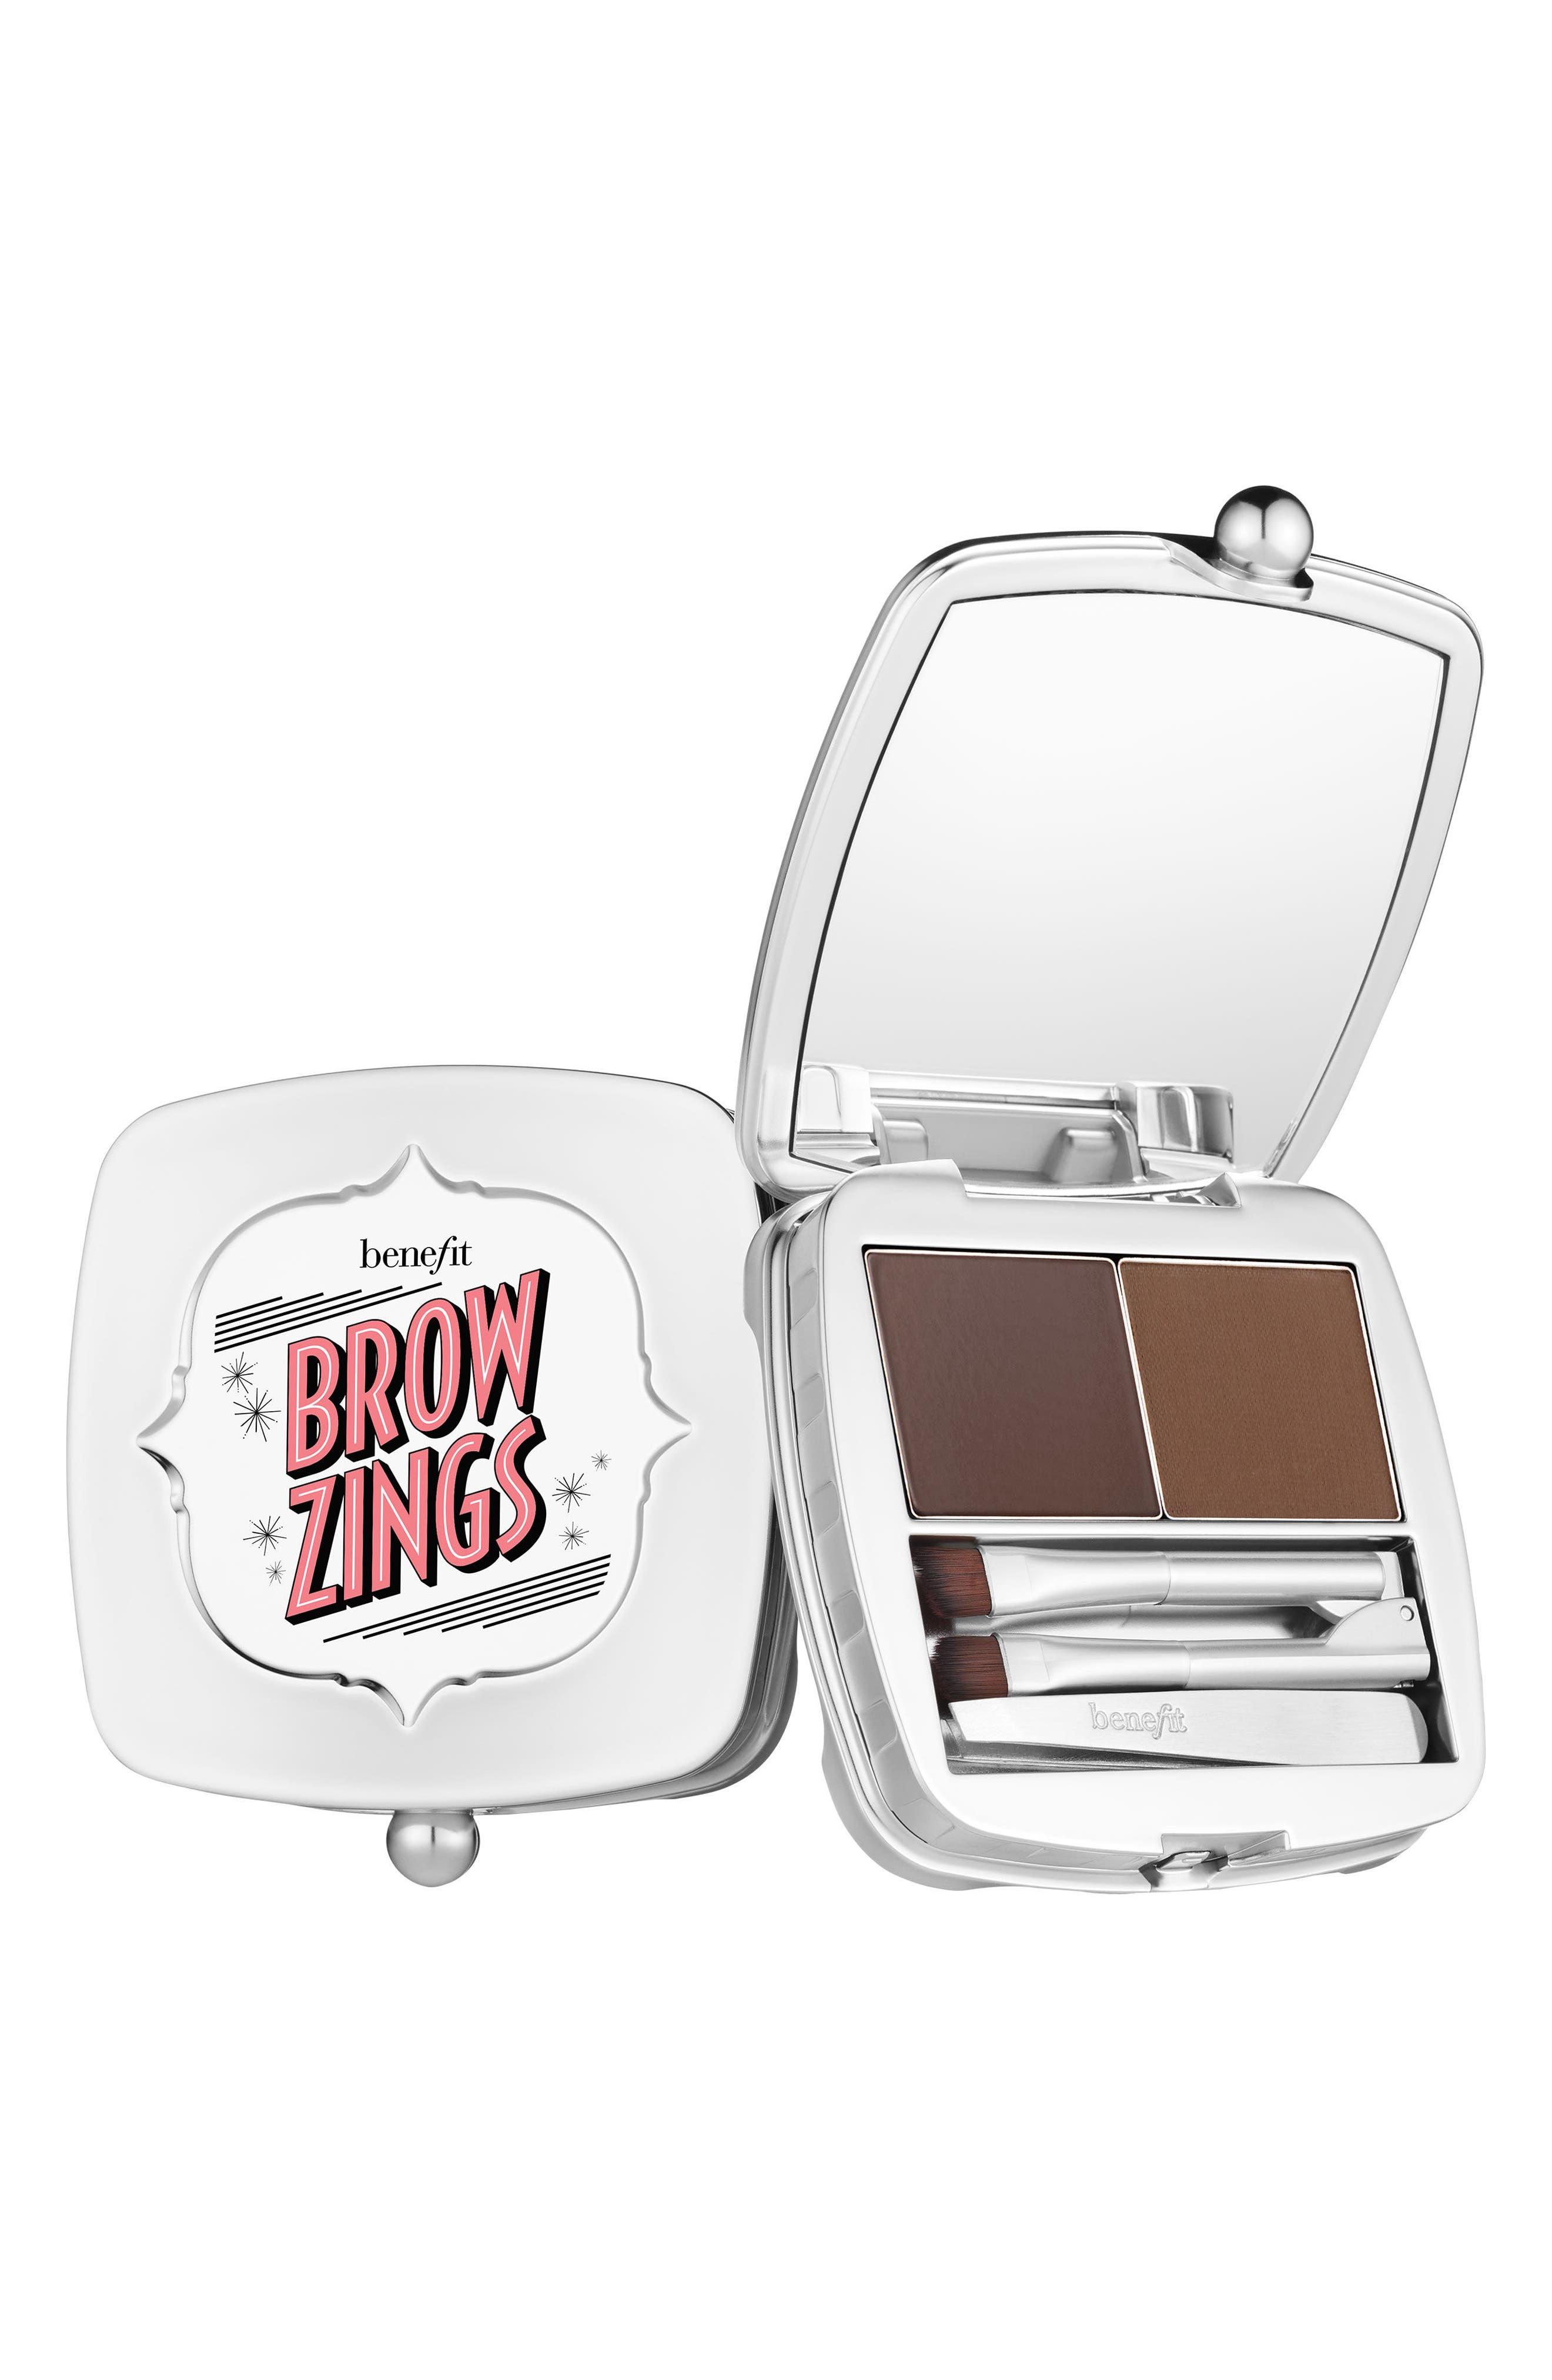 Benefit Brow Zings Tame & Shape Kit